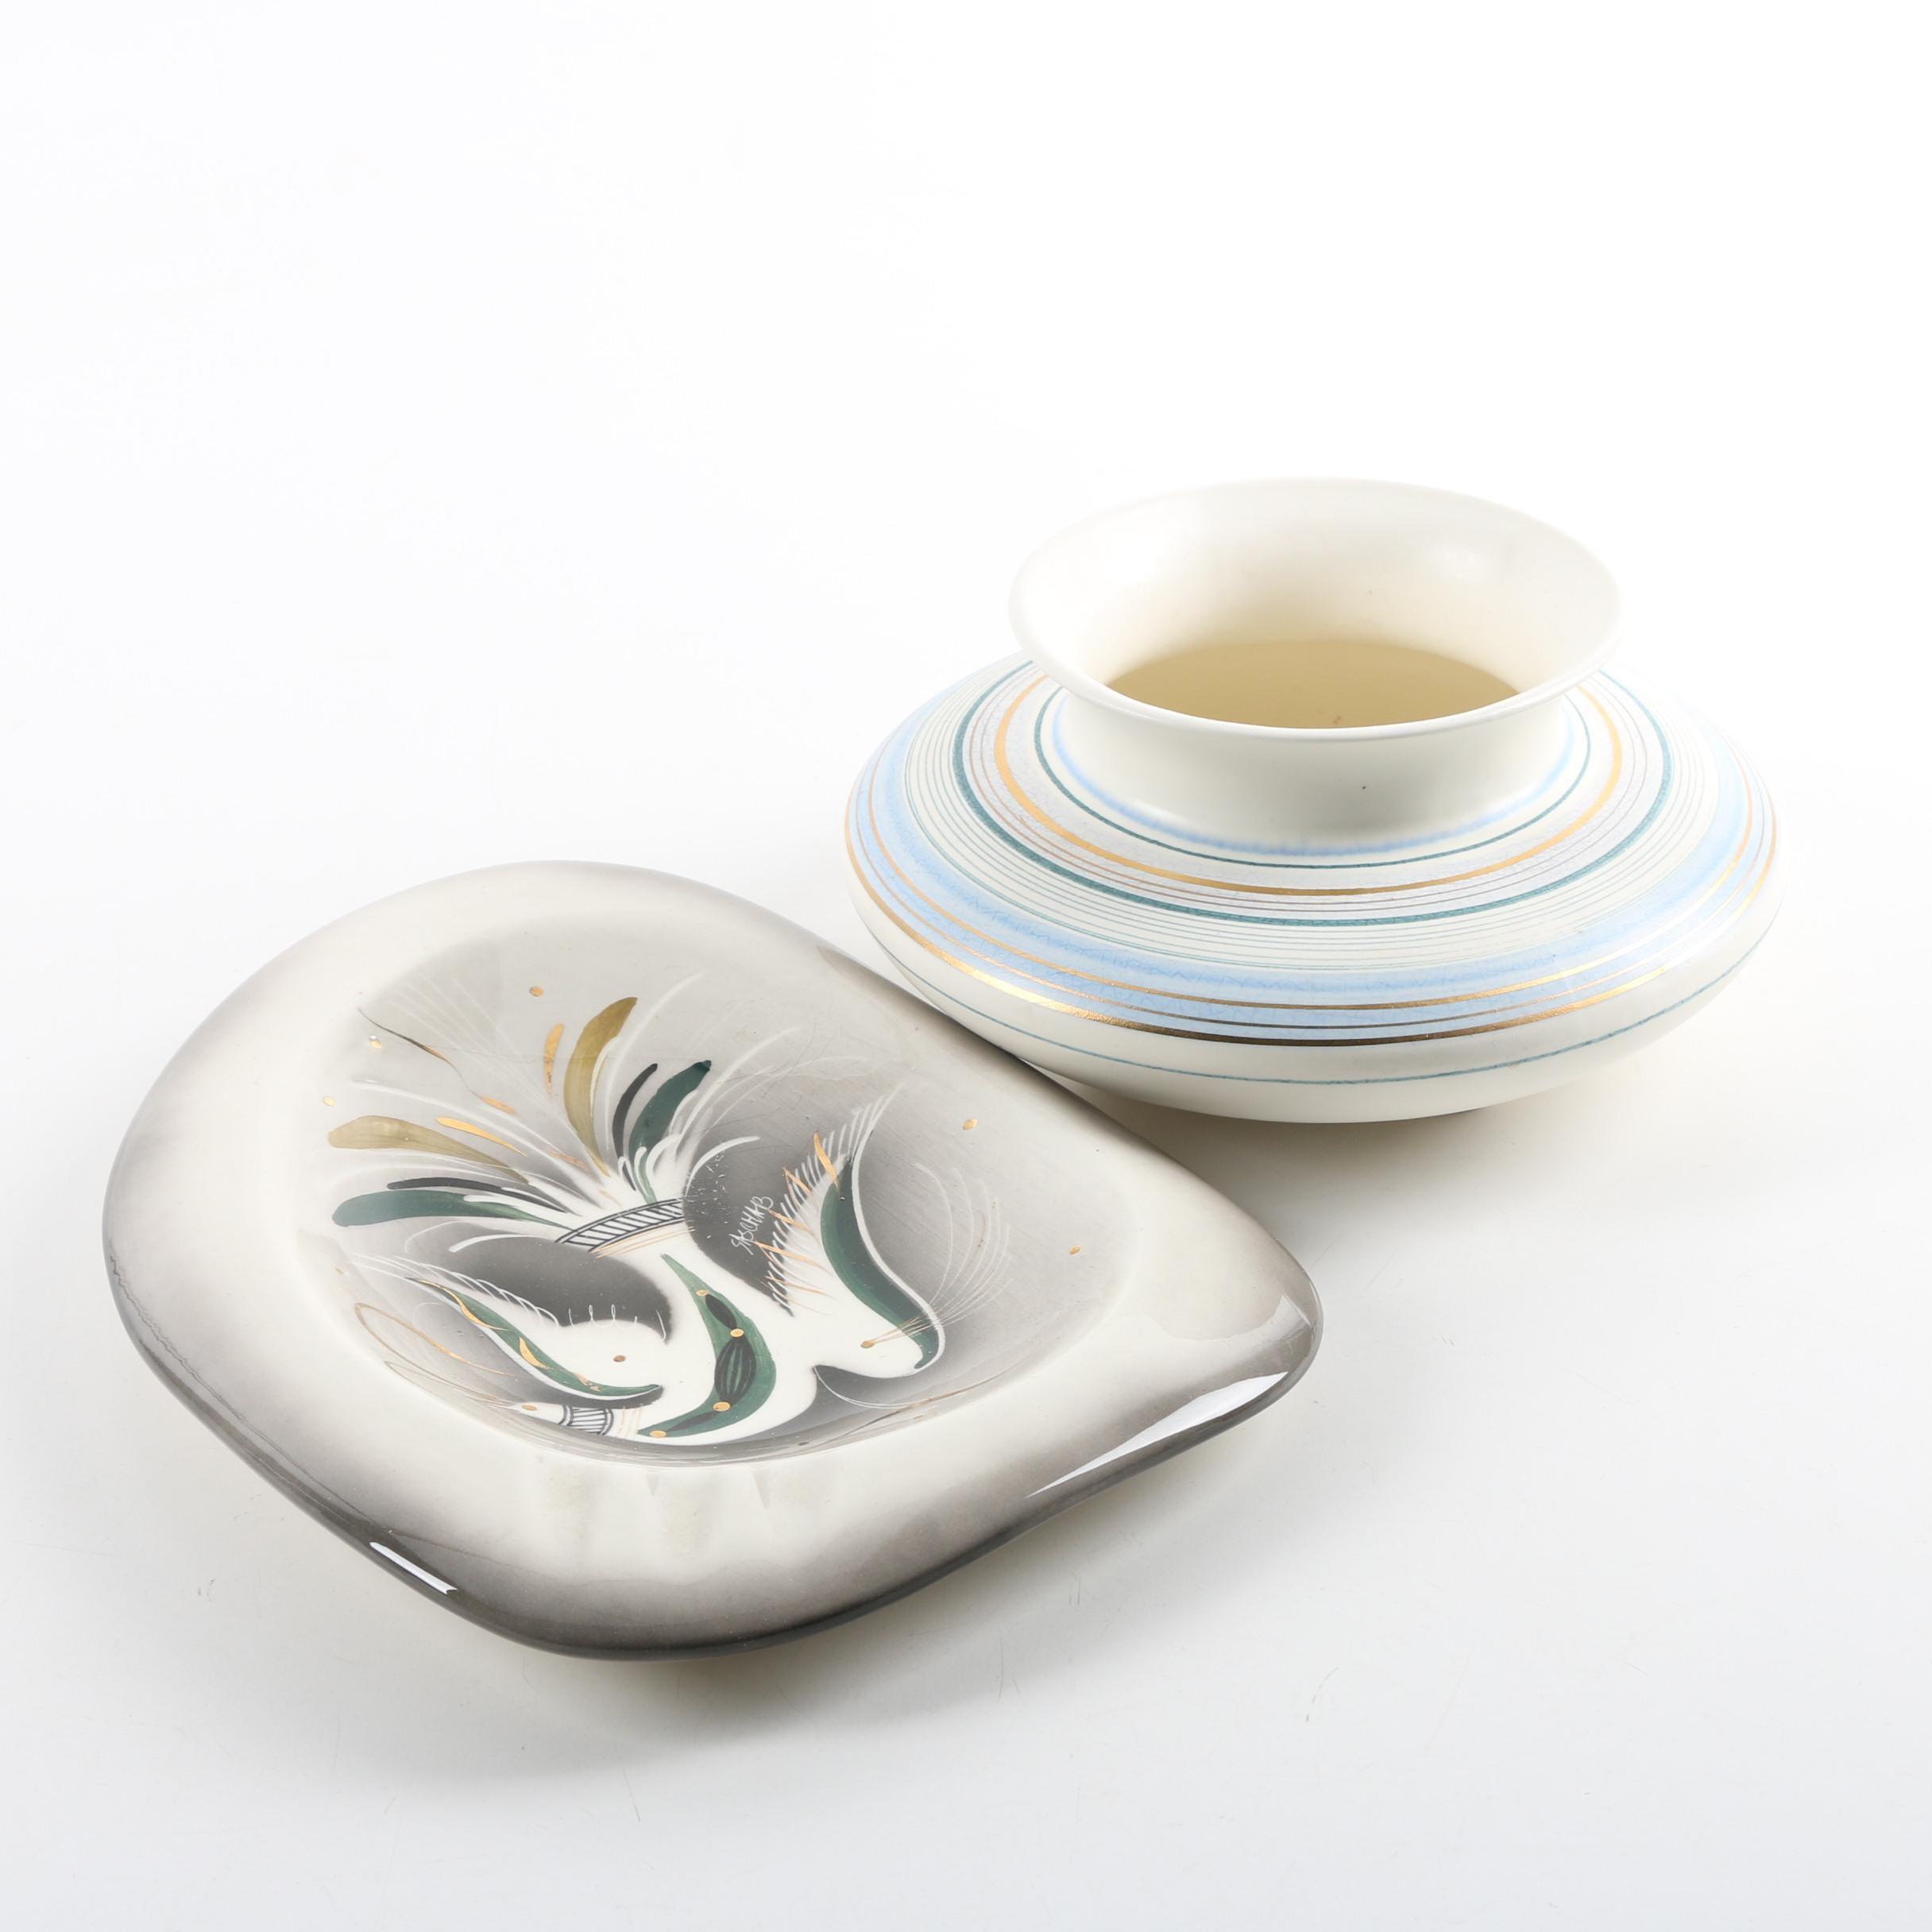 Mid Century Modern Sascha Brastoff Ceramic Dishes